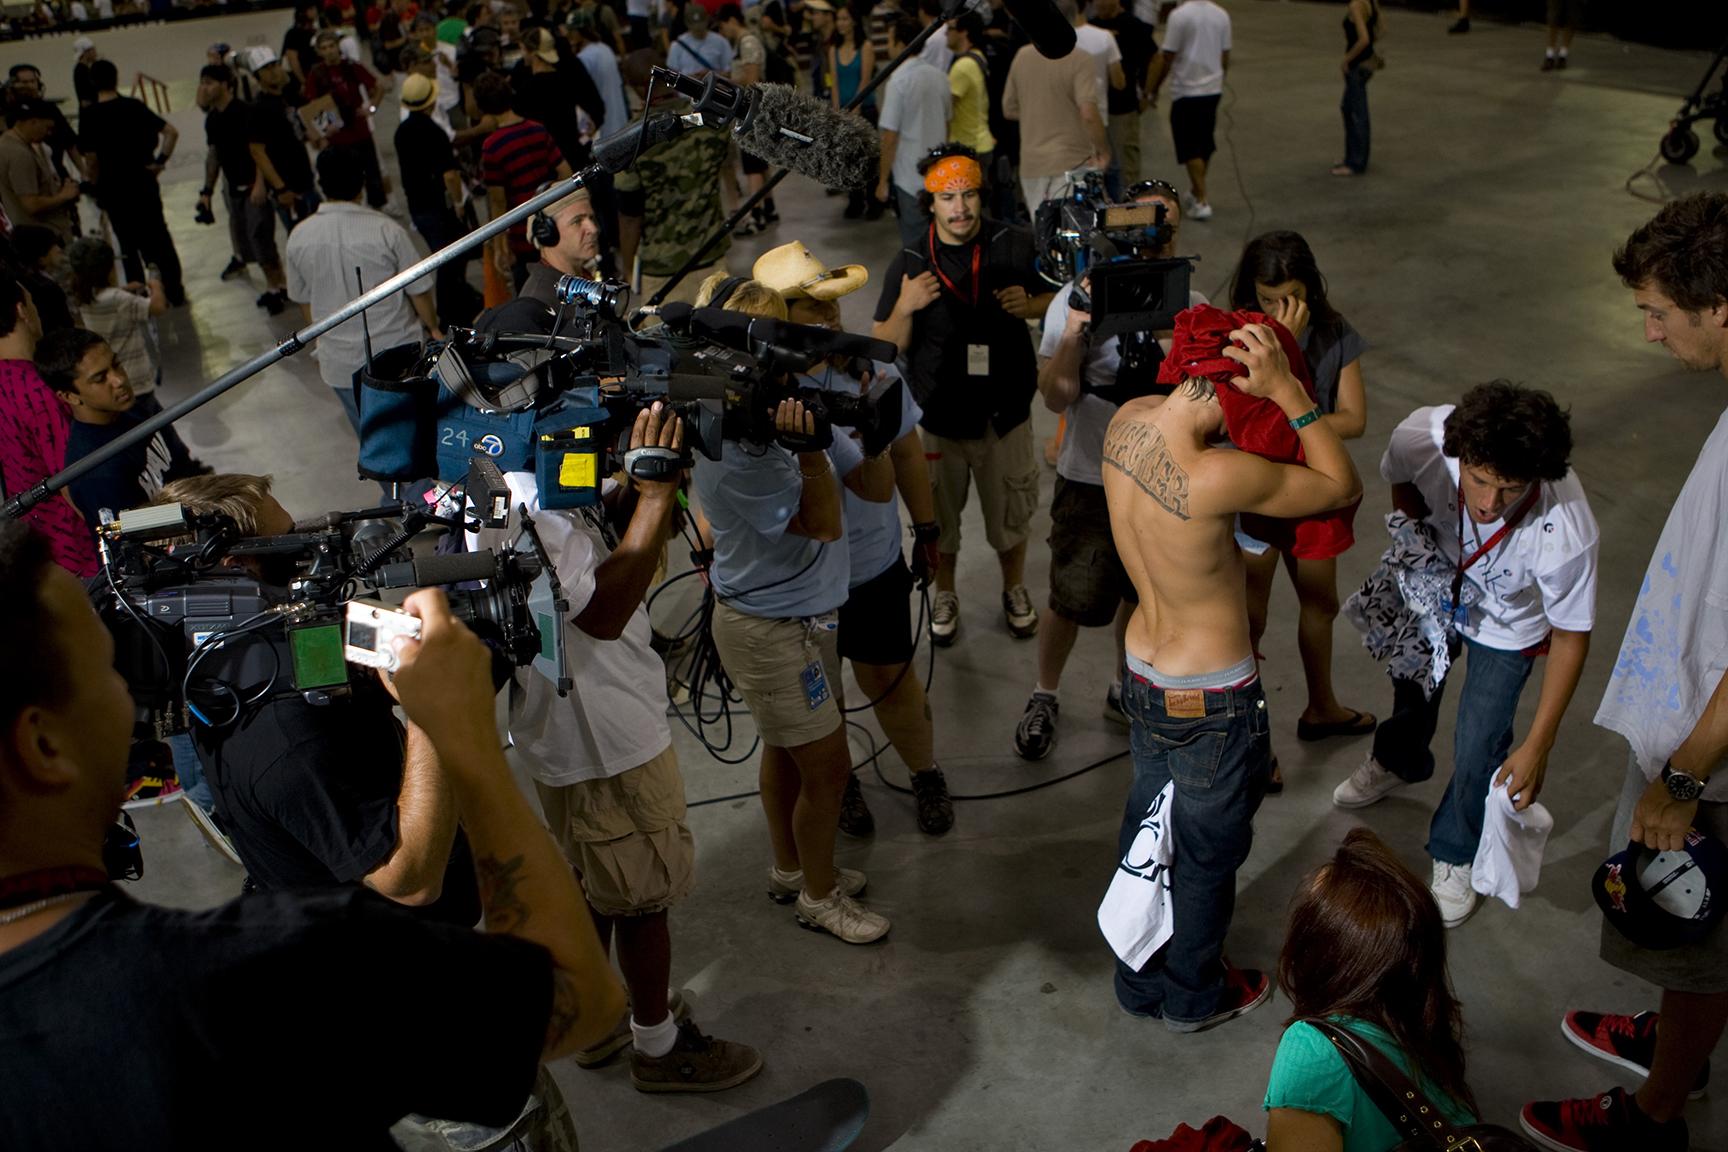 Media swarm